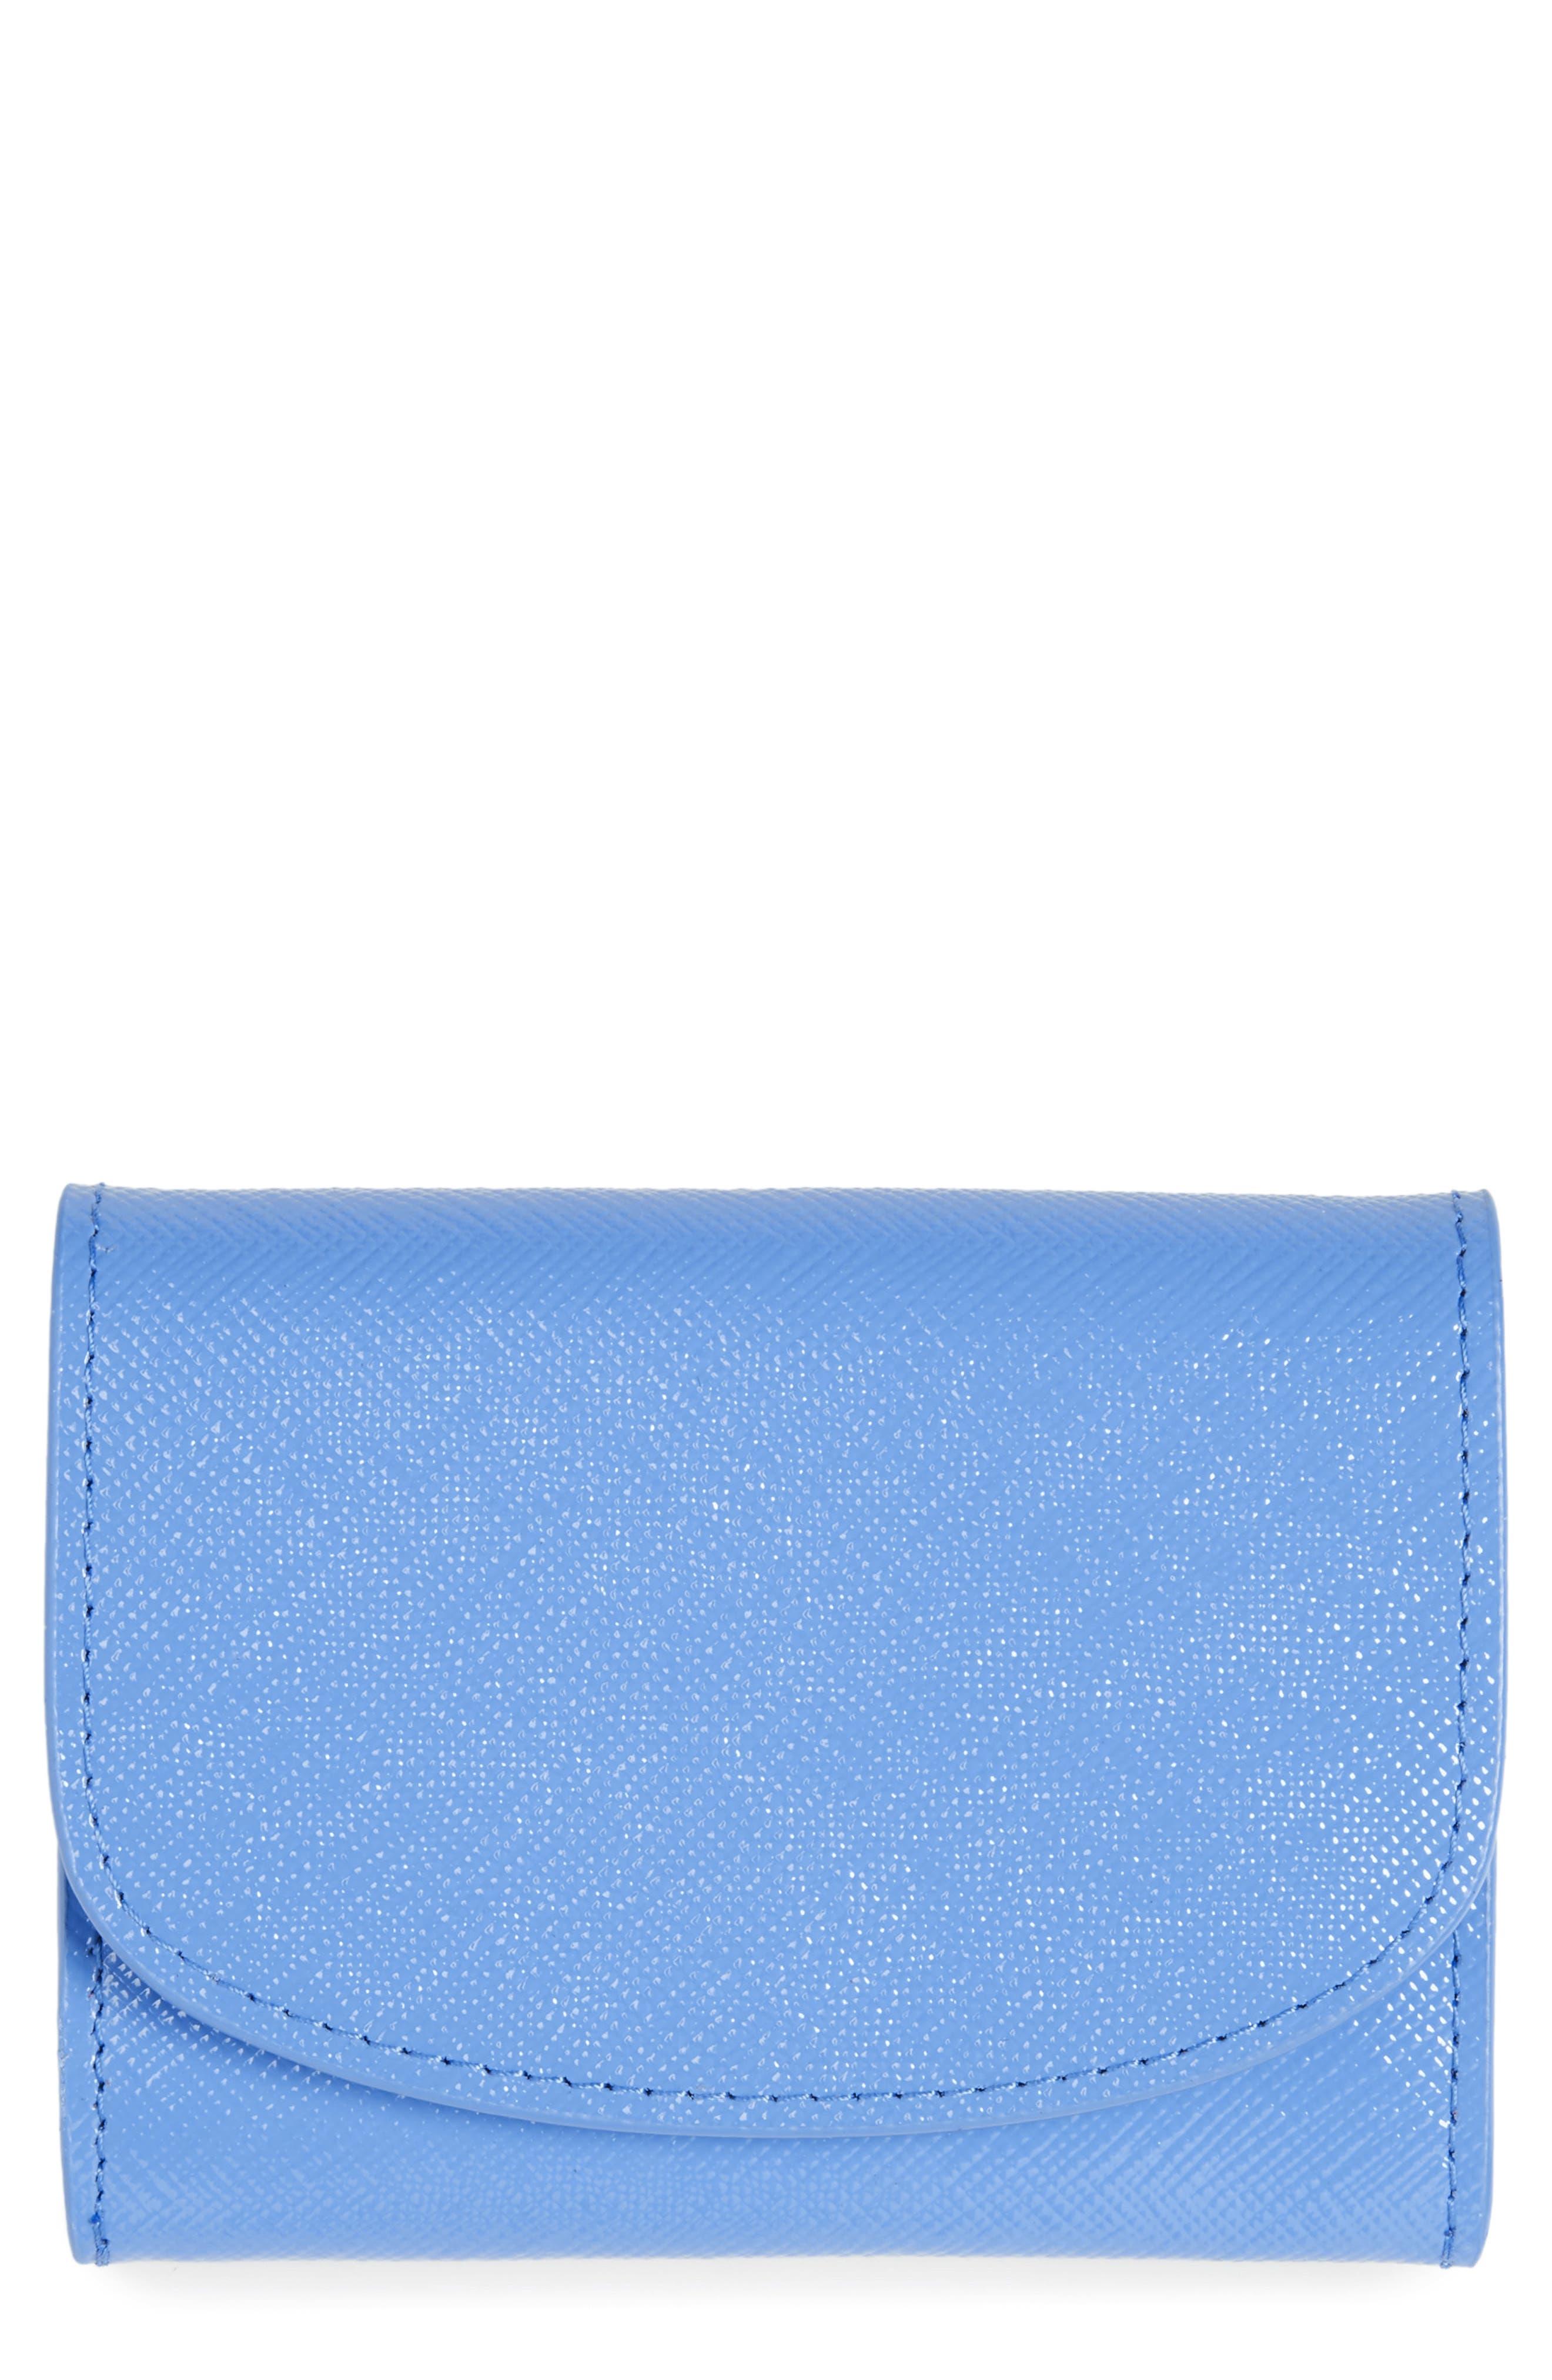 Leather Card Holder,                         Main,                         color, Blue Regatta